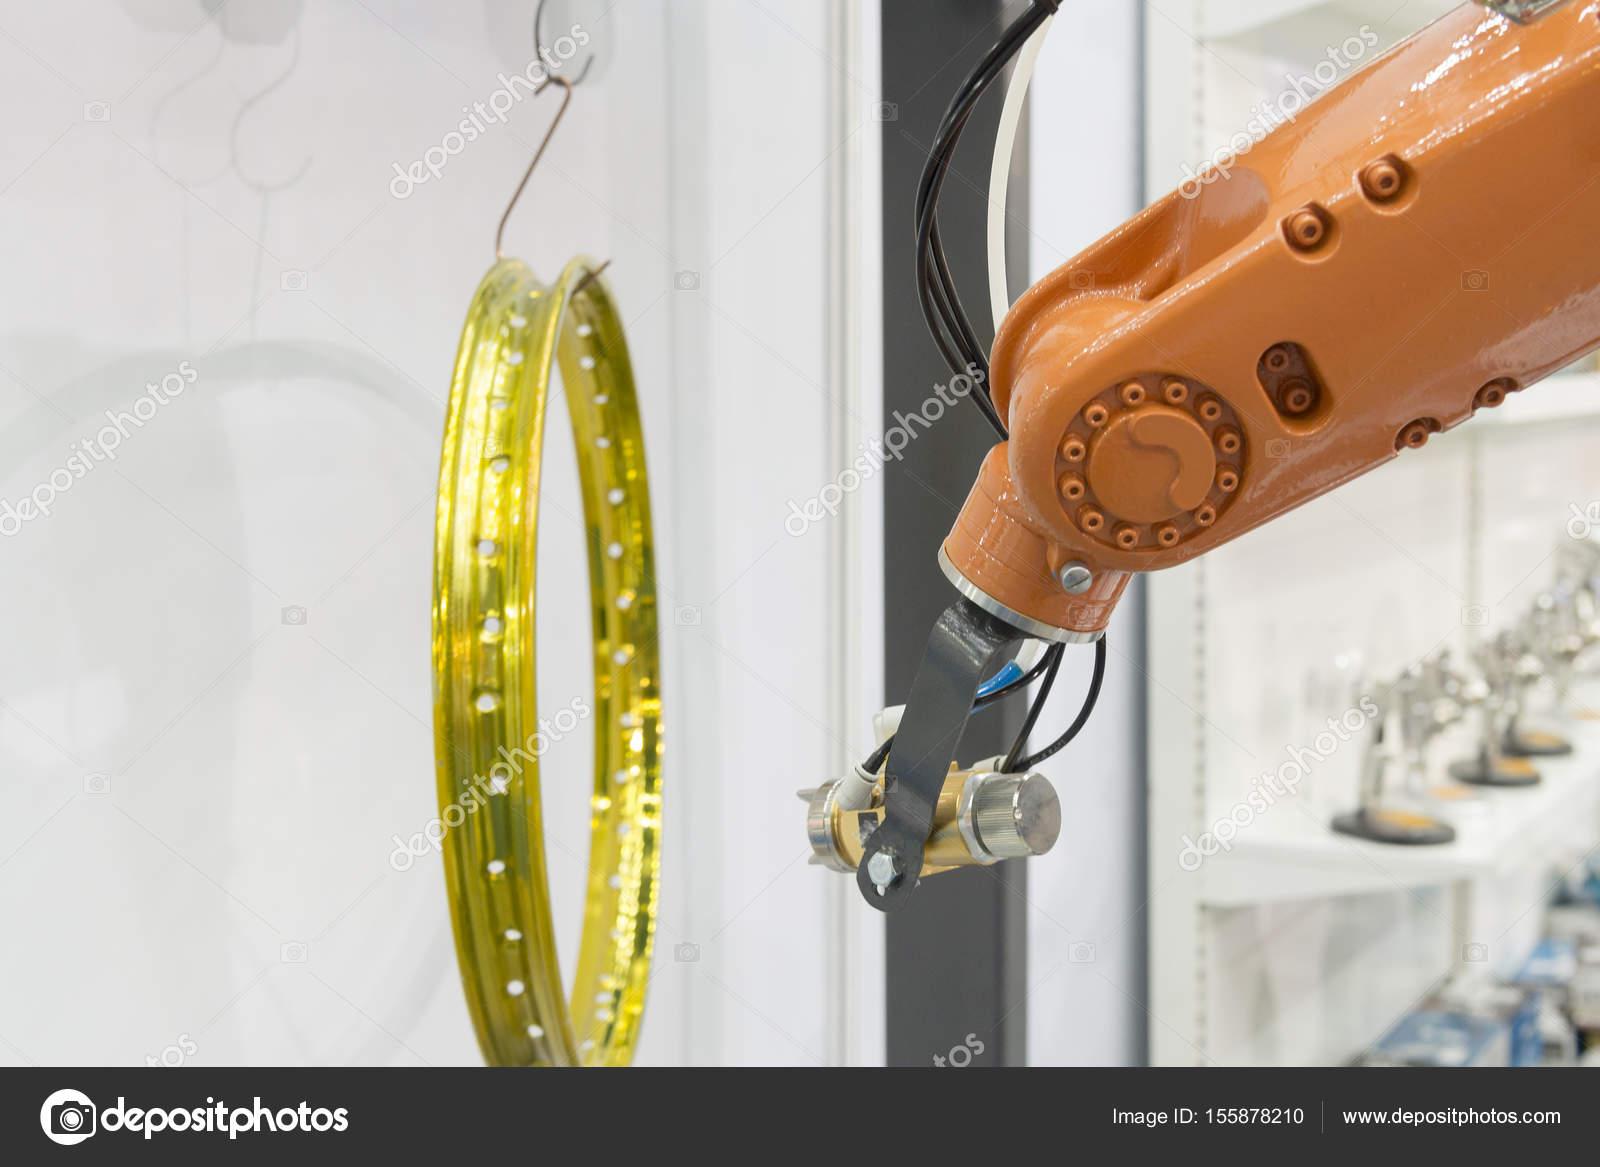 El robot de pintura la pintura de aerosol — Fotos de Stock © phuchit ...